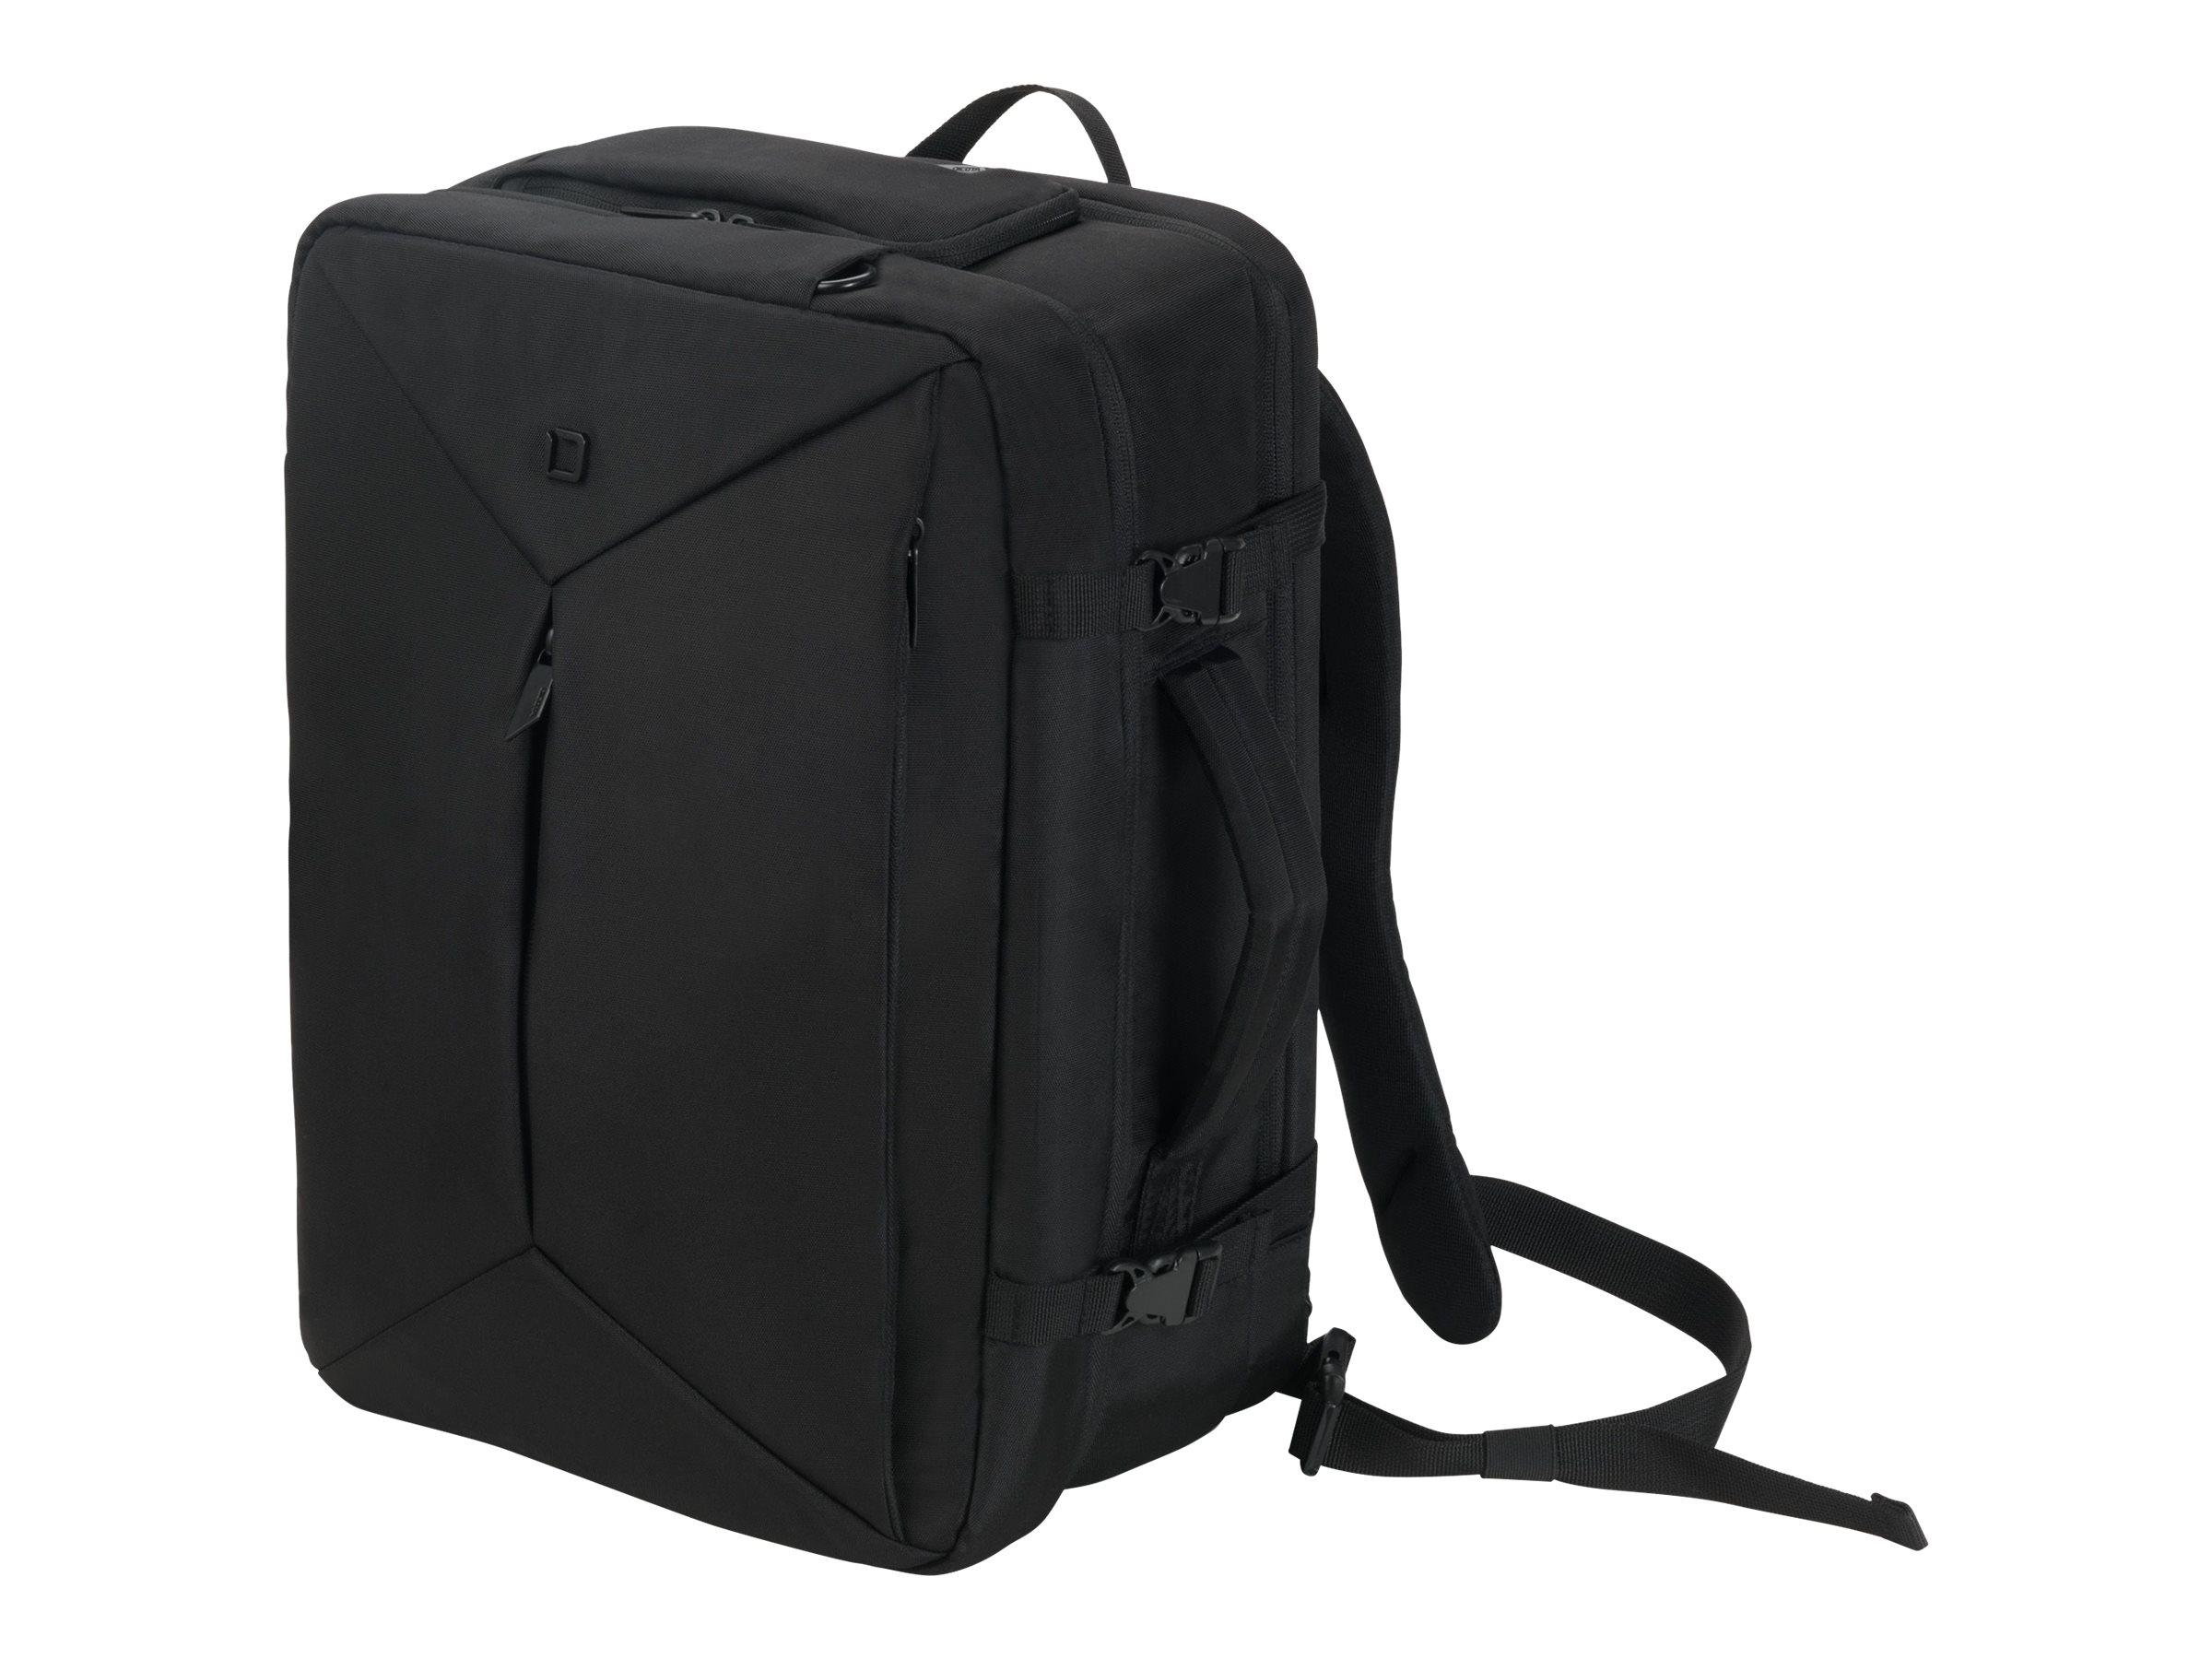 DICOTA Backpack Dual Plus EDGE - Notebook-Rucksack - 39.6 cm - 13